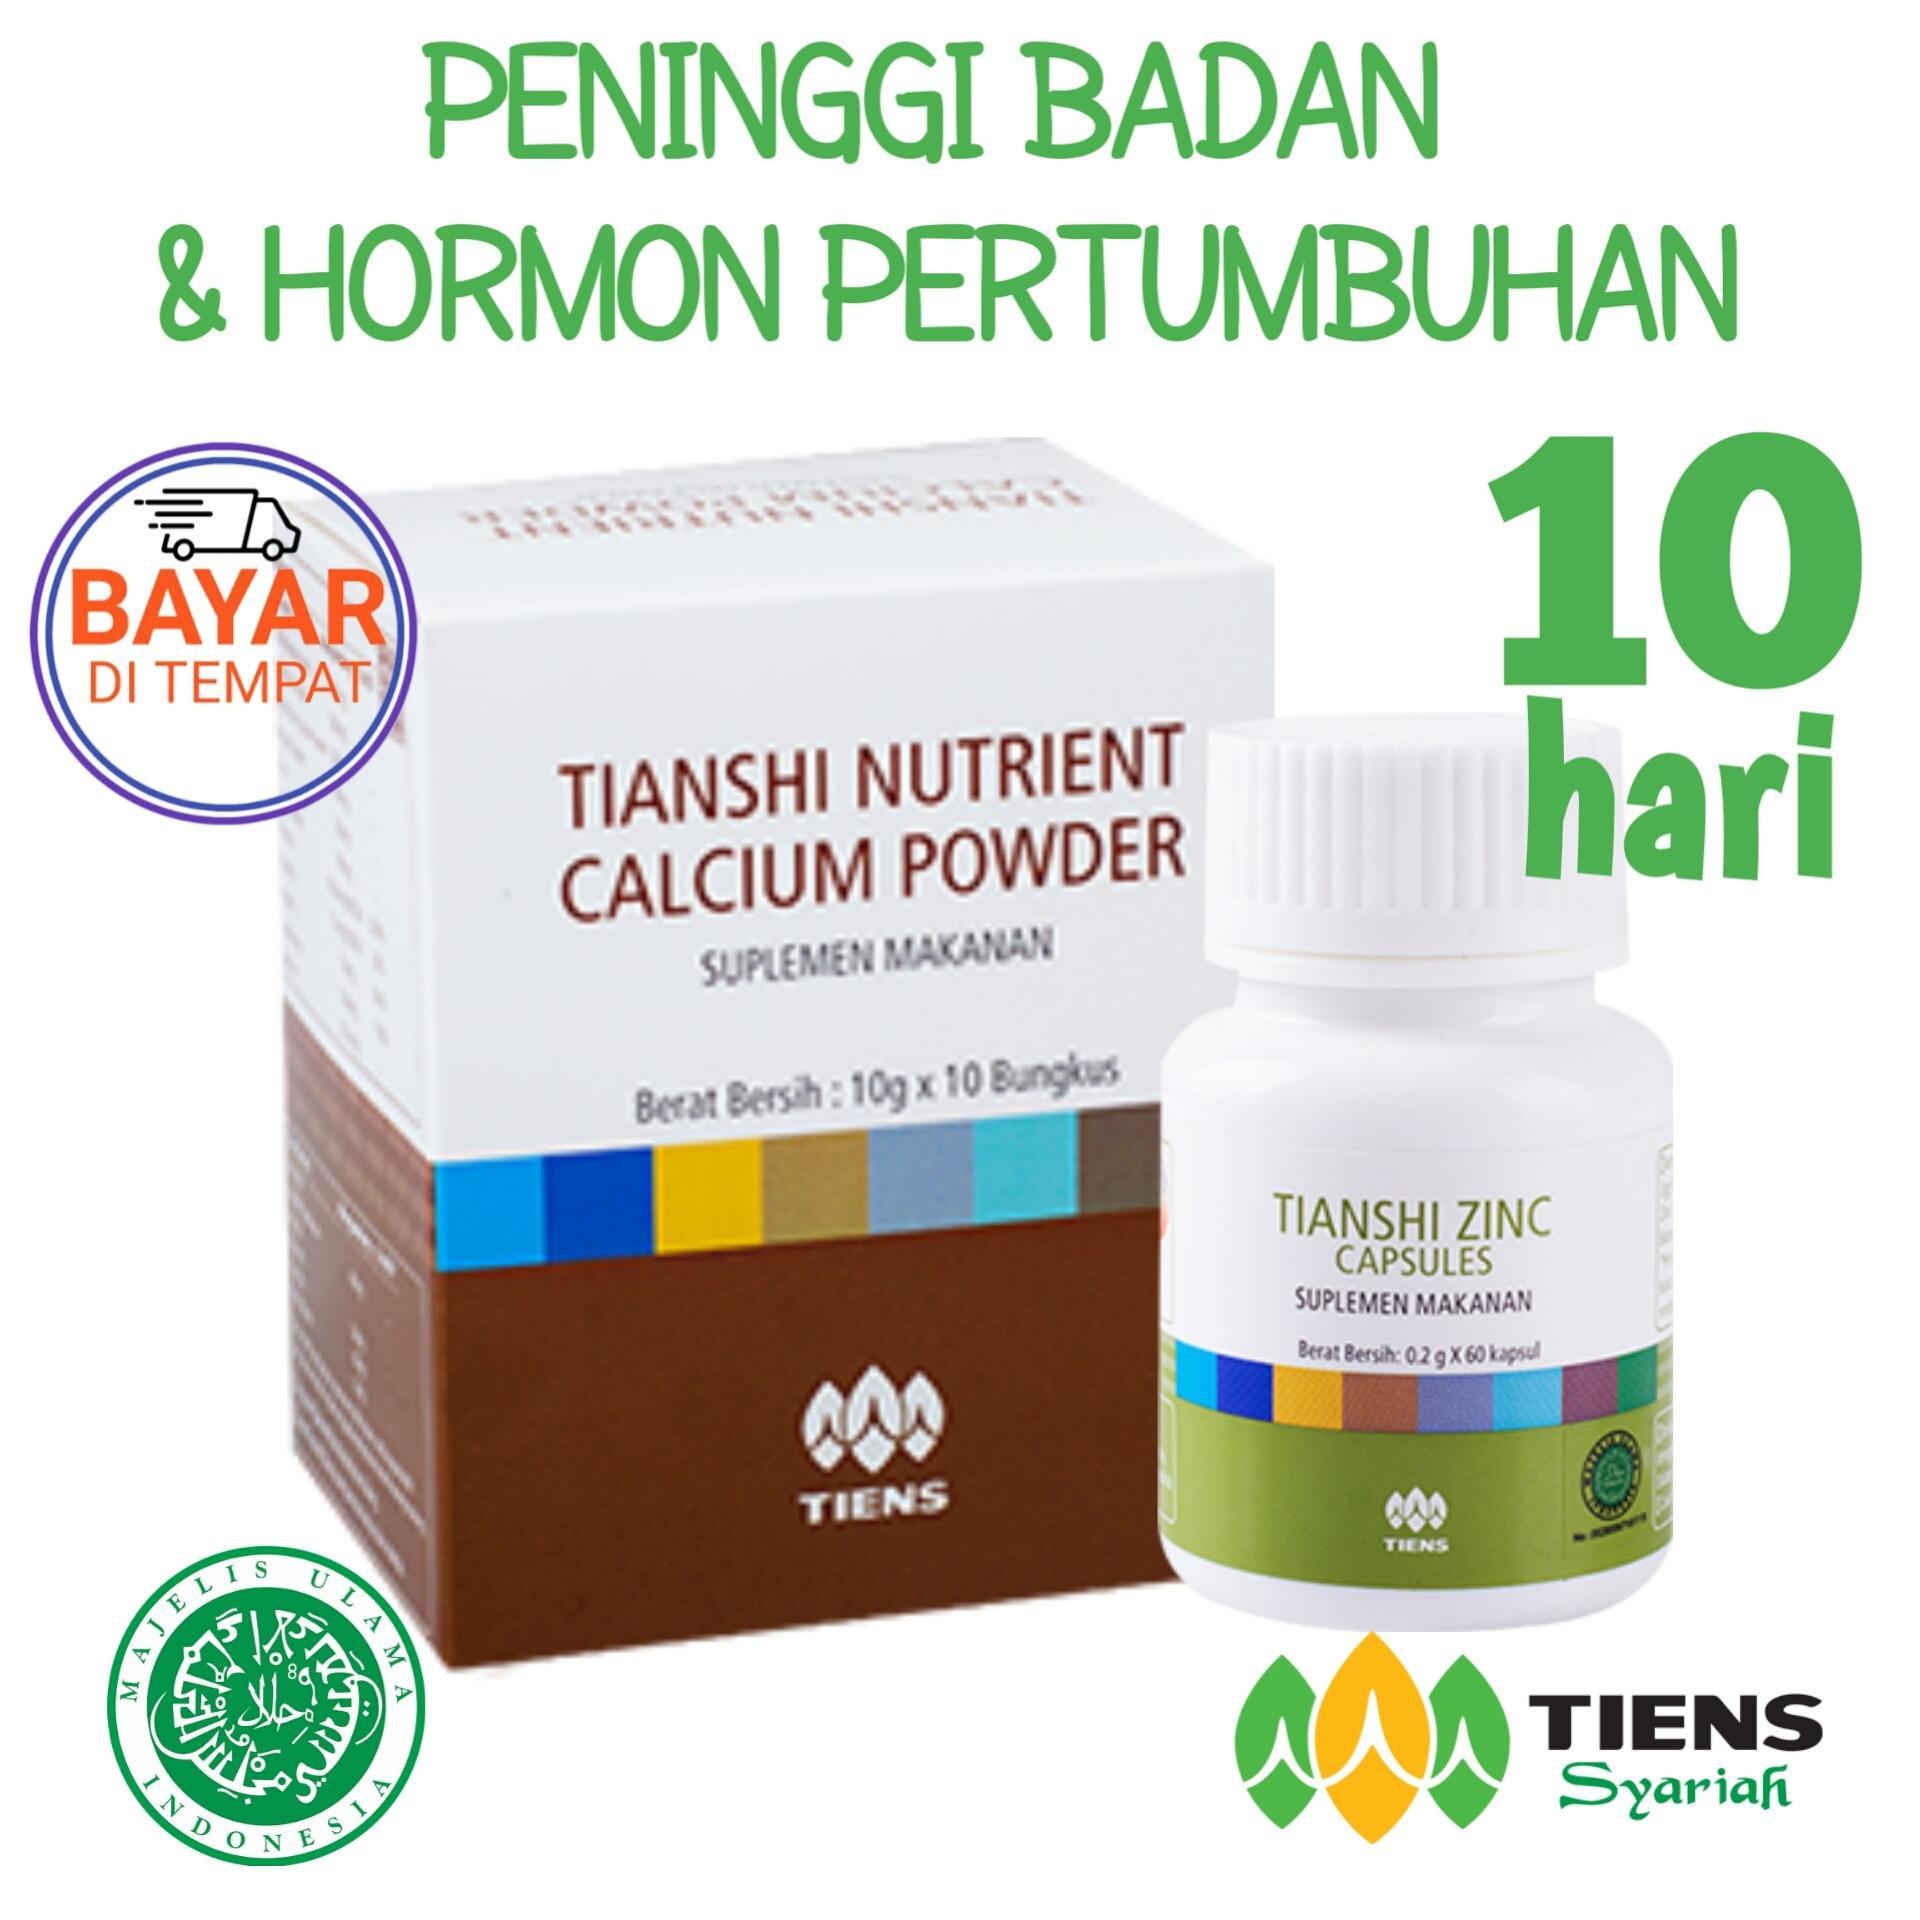 Review Tiens Peninggi Badan Paket 1 Box Calsium 1 Botol Zinc Promo Banting Harga Free Member Voucher Jawa Timur